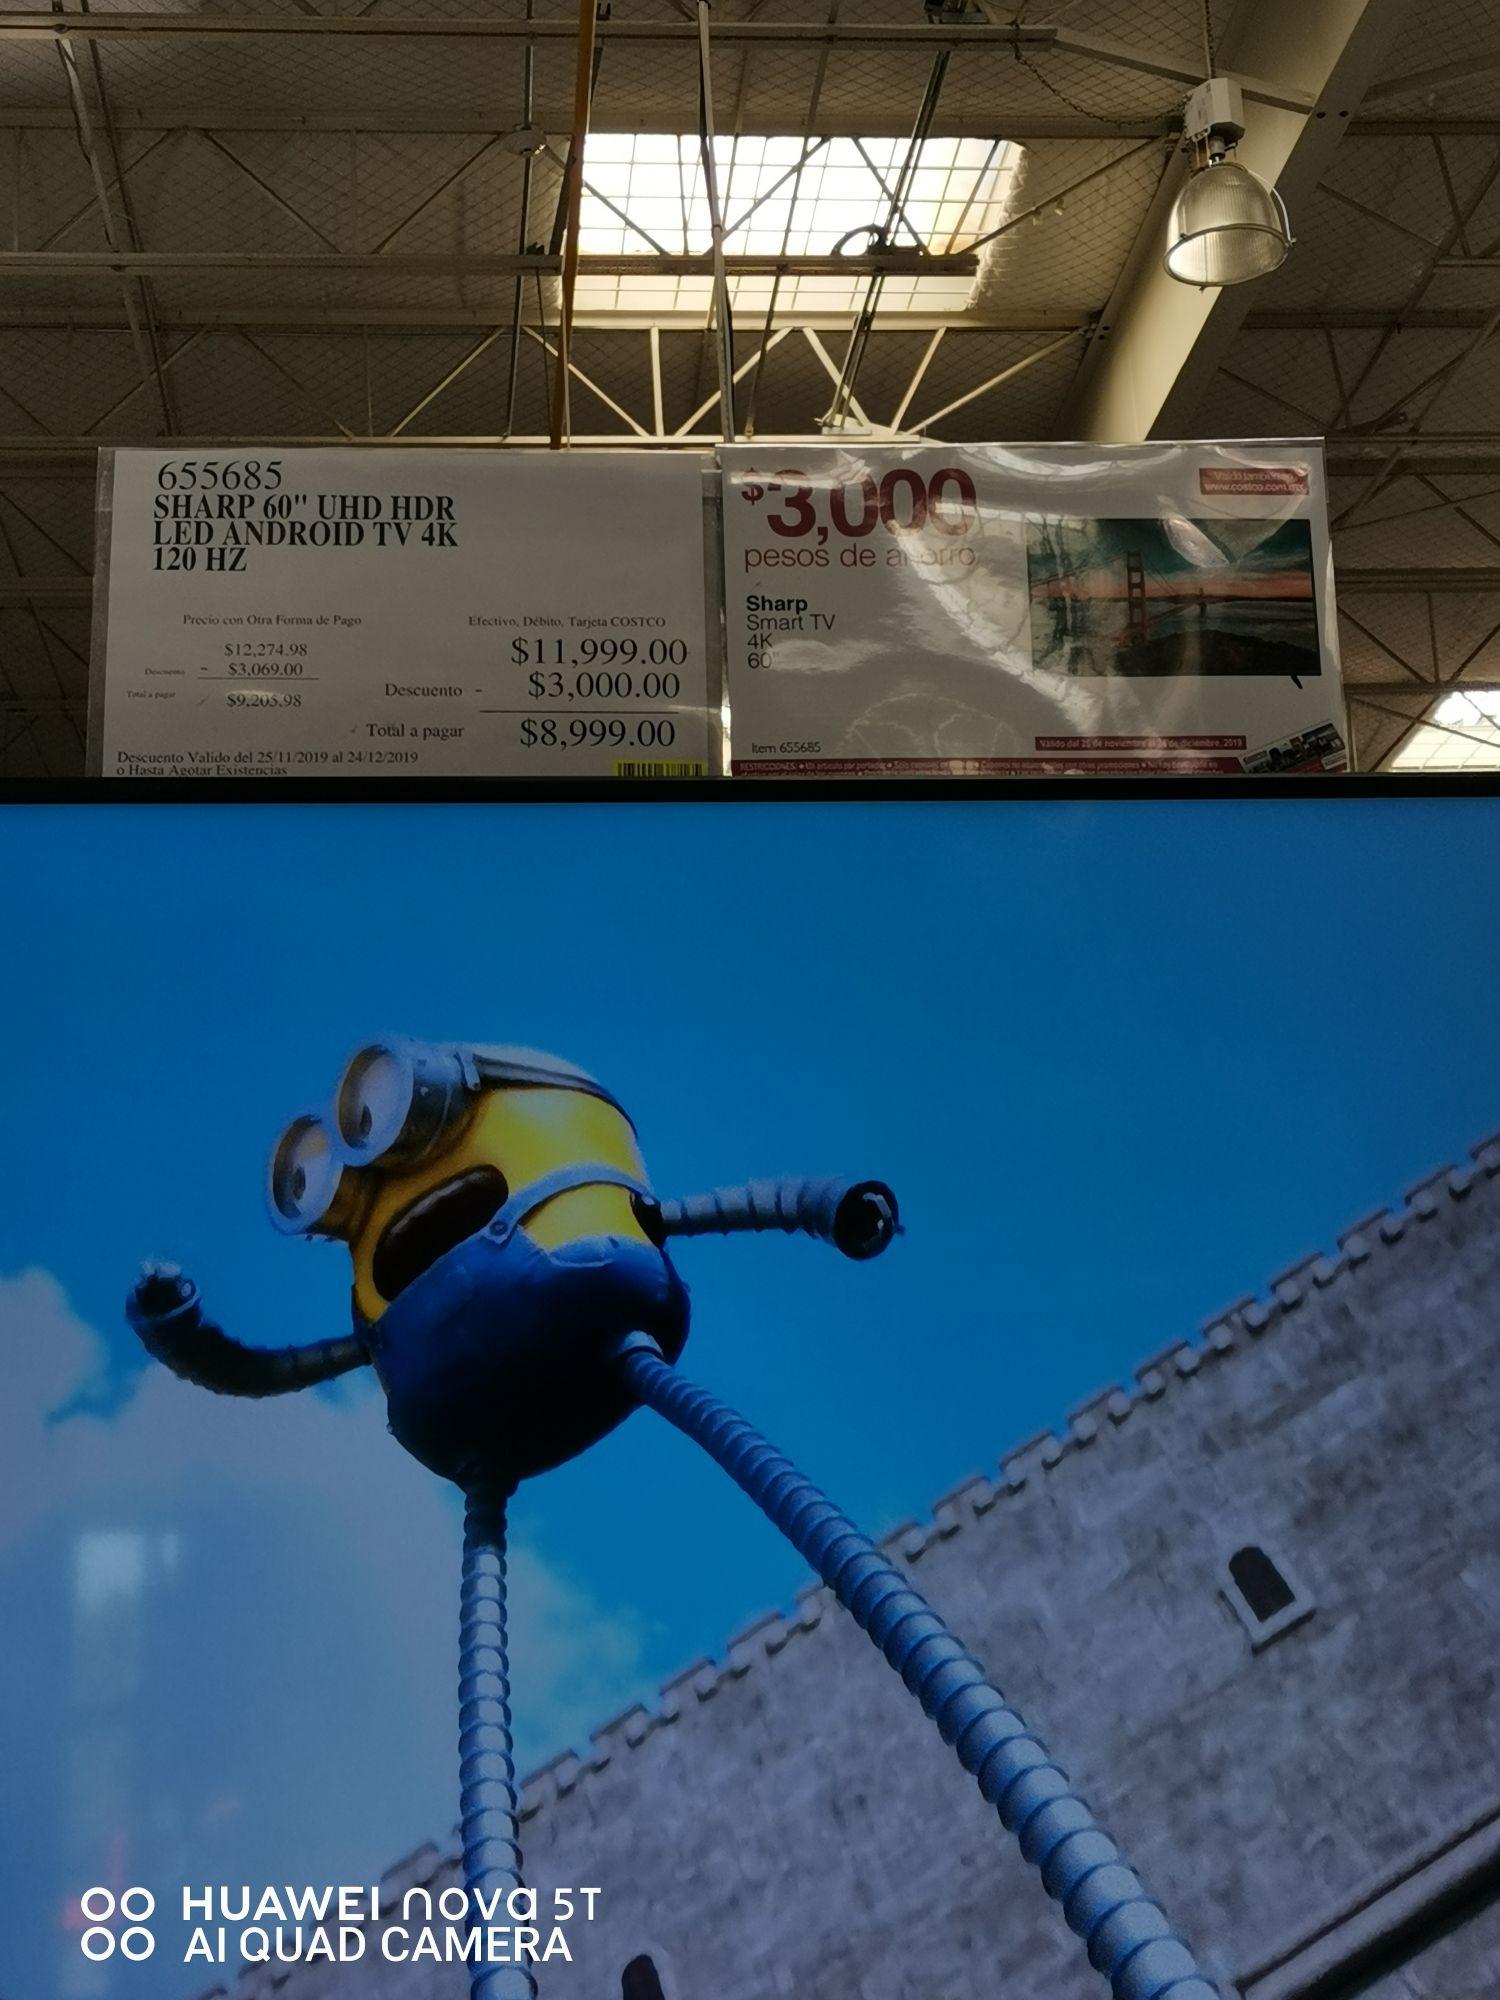 Costco San Luis Potosí: Sharp 4k smart tv 60''